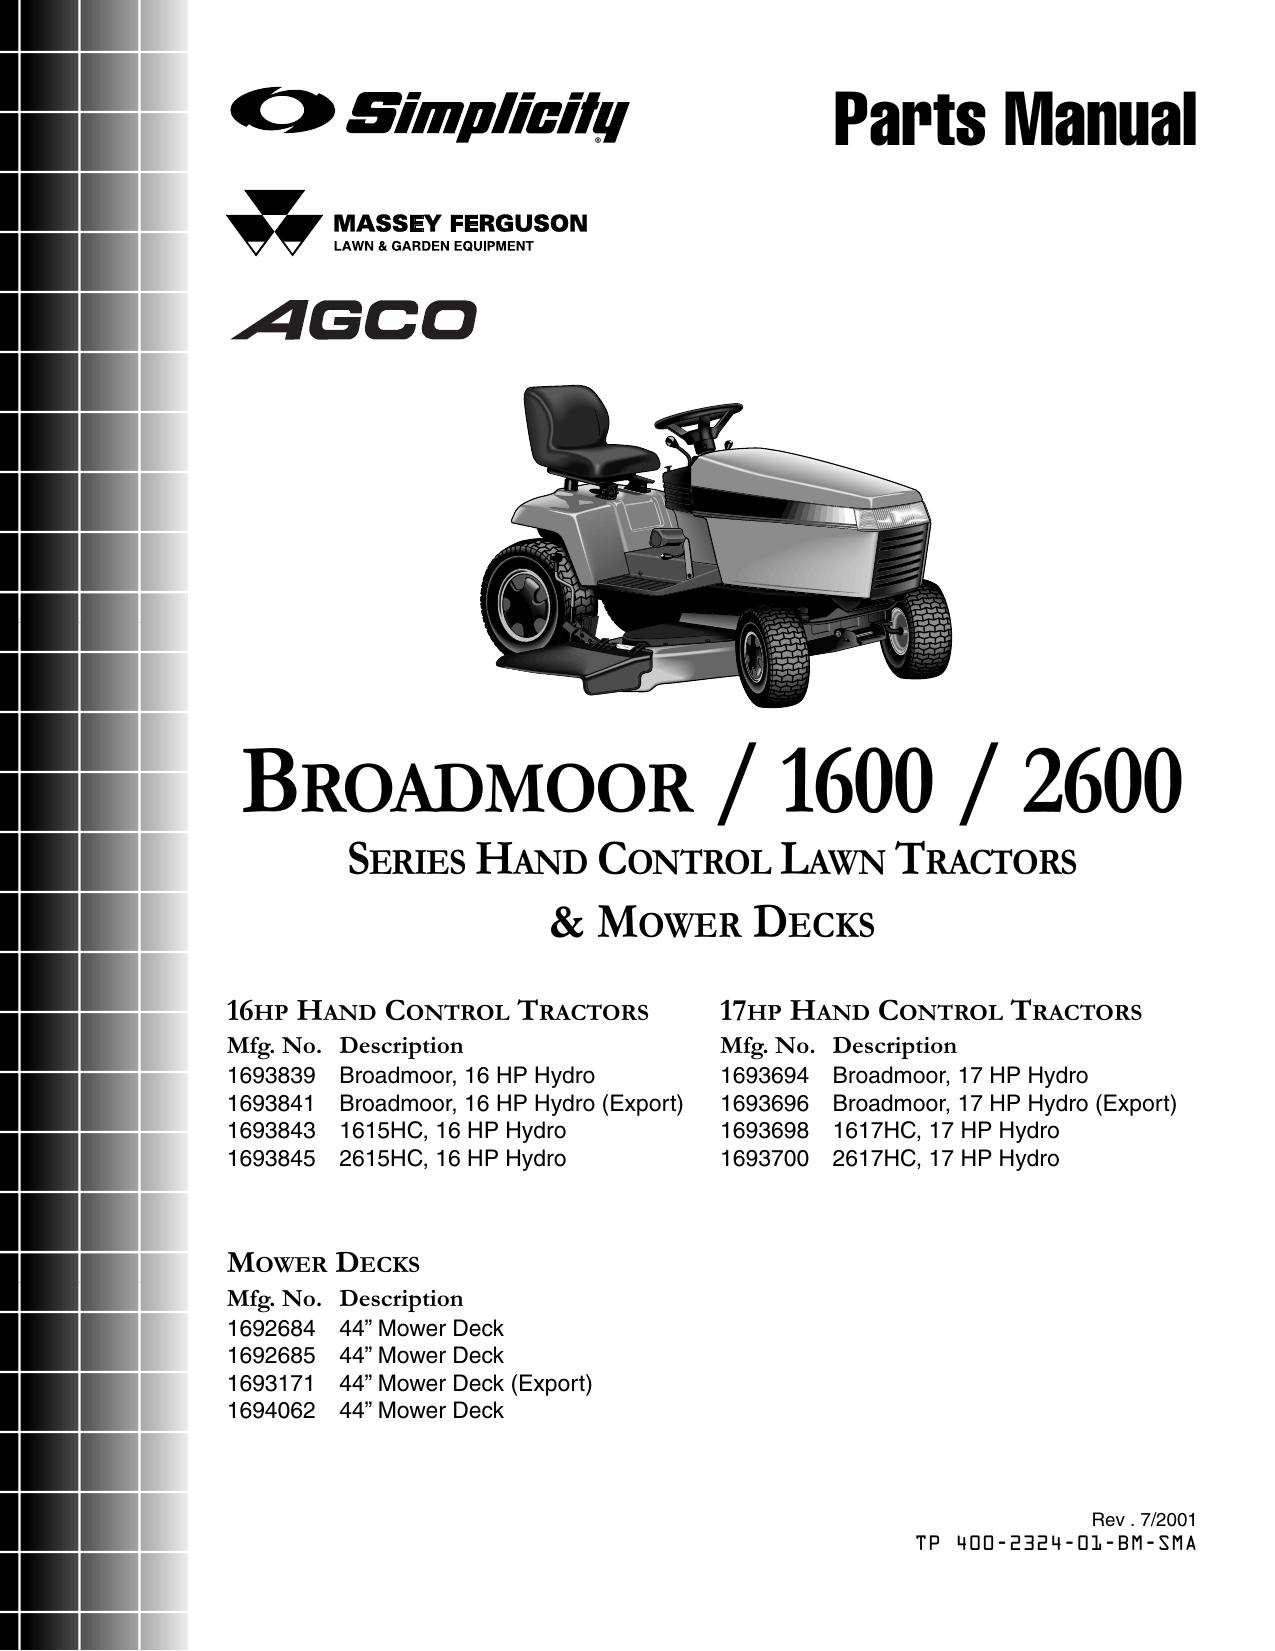 Simplicity Broadmoor 1600 Users Manual TP_400_2324_01_BM_SMA